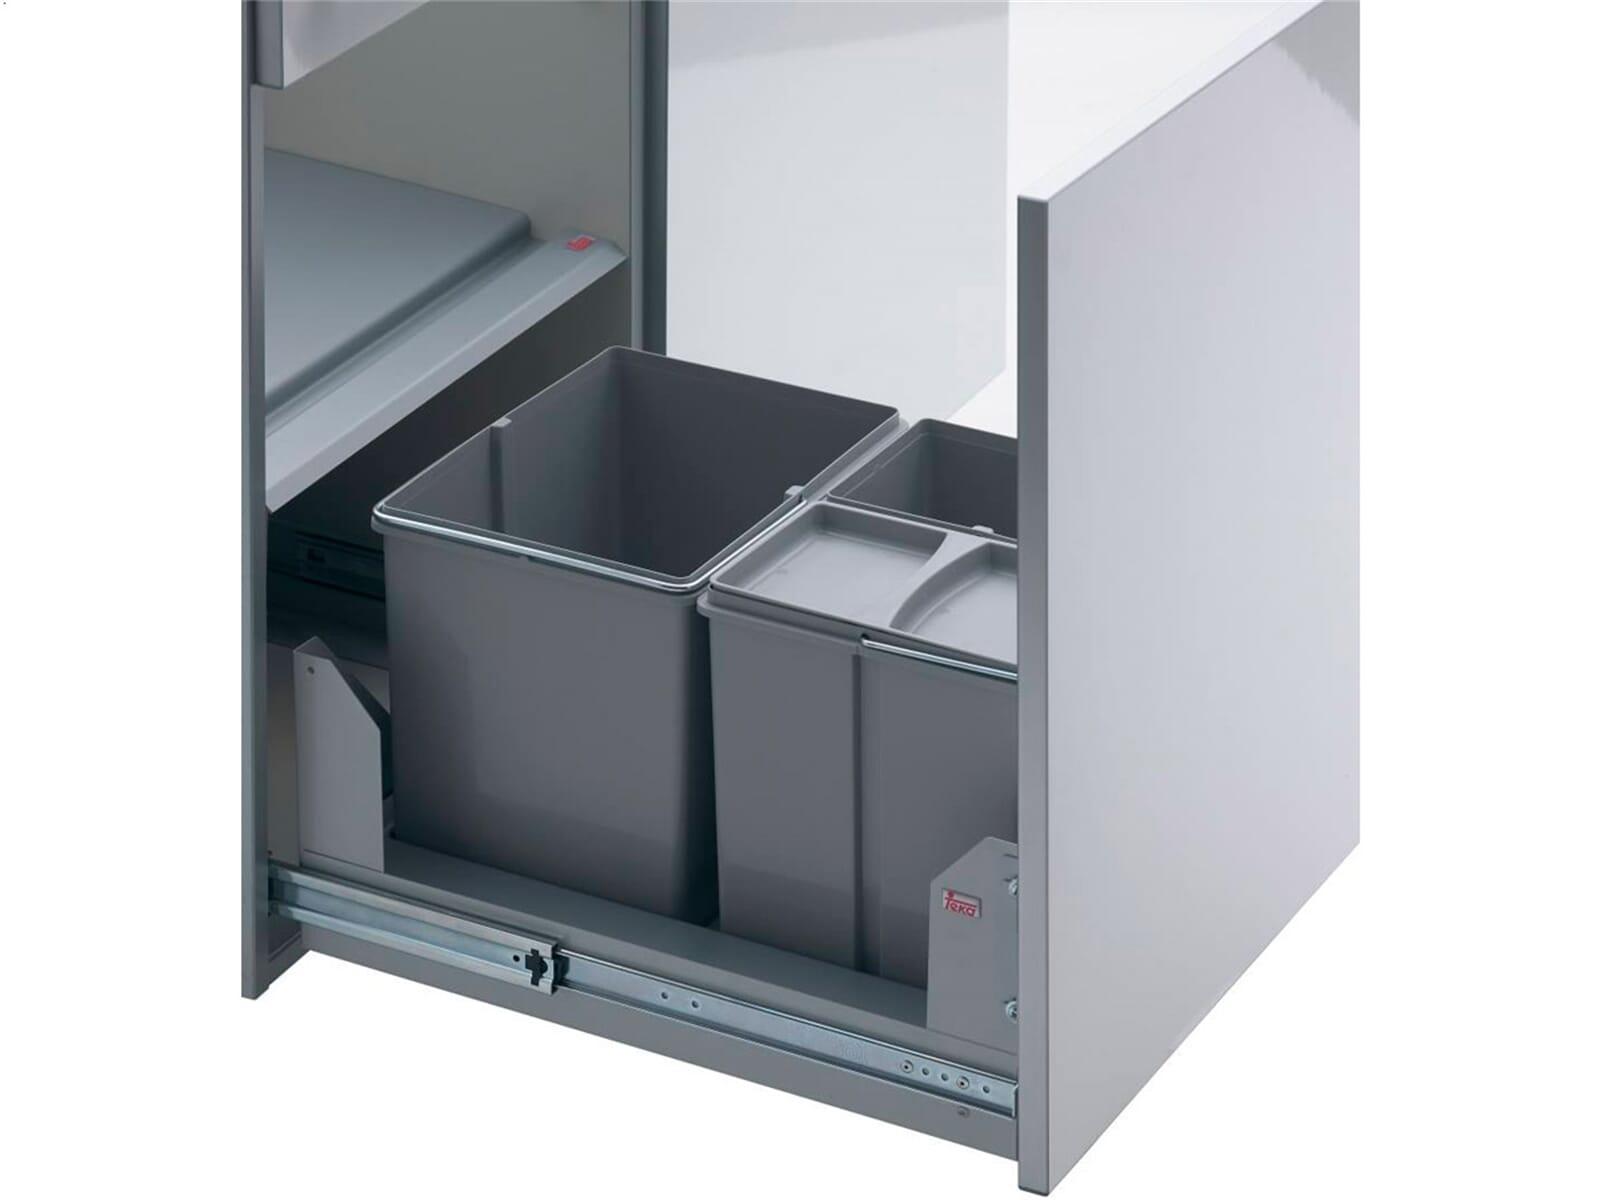 Teka TekaDepot 50 Comfort Einbau Abfallsammler